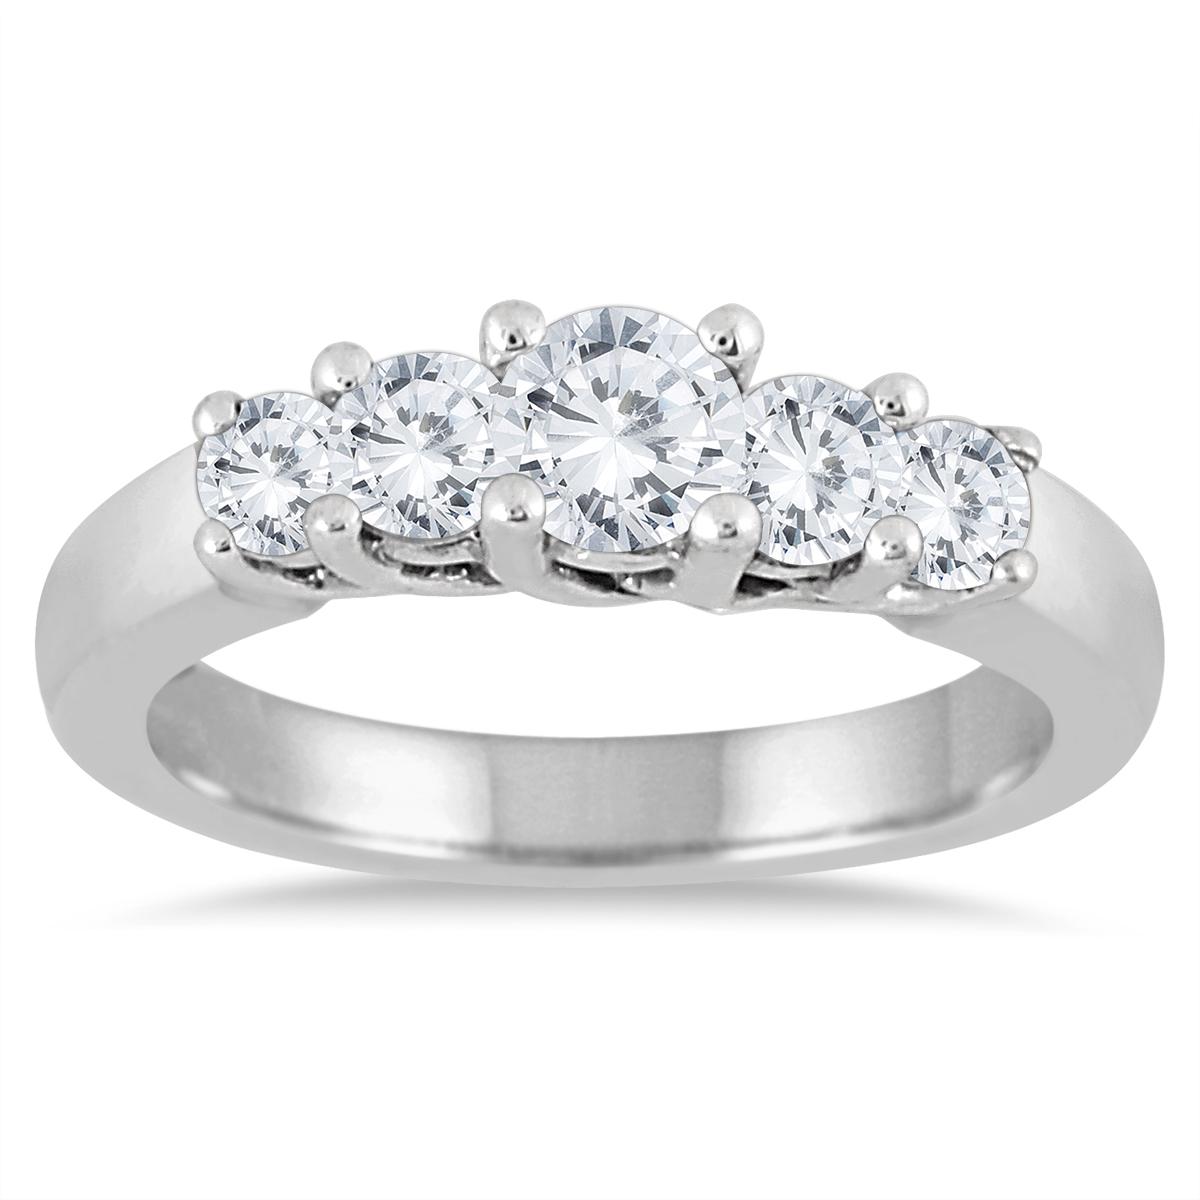 1 Carat TW Five Stone Diamond Wedding Band in 10K White Gold